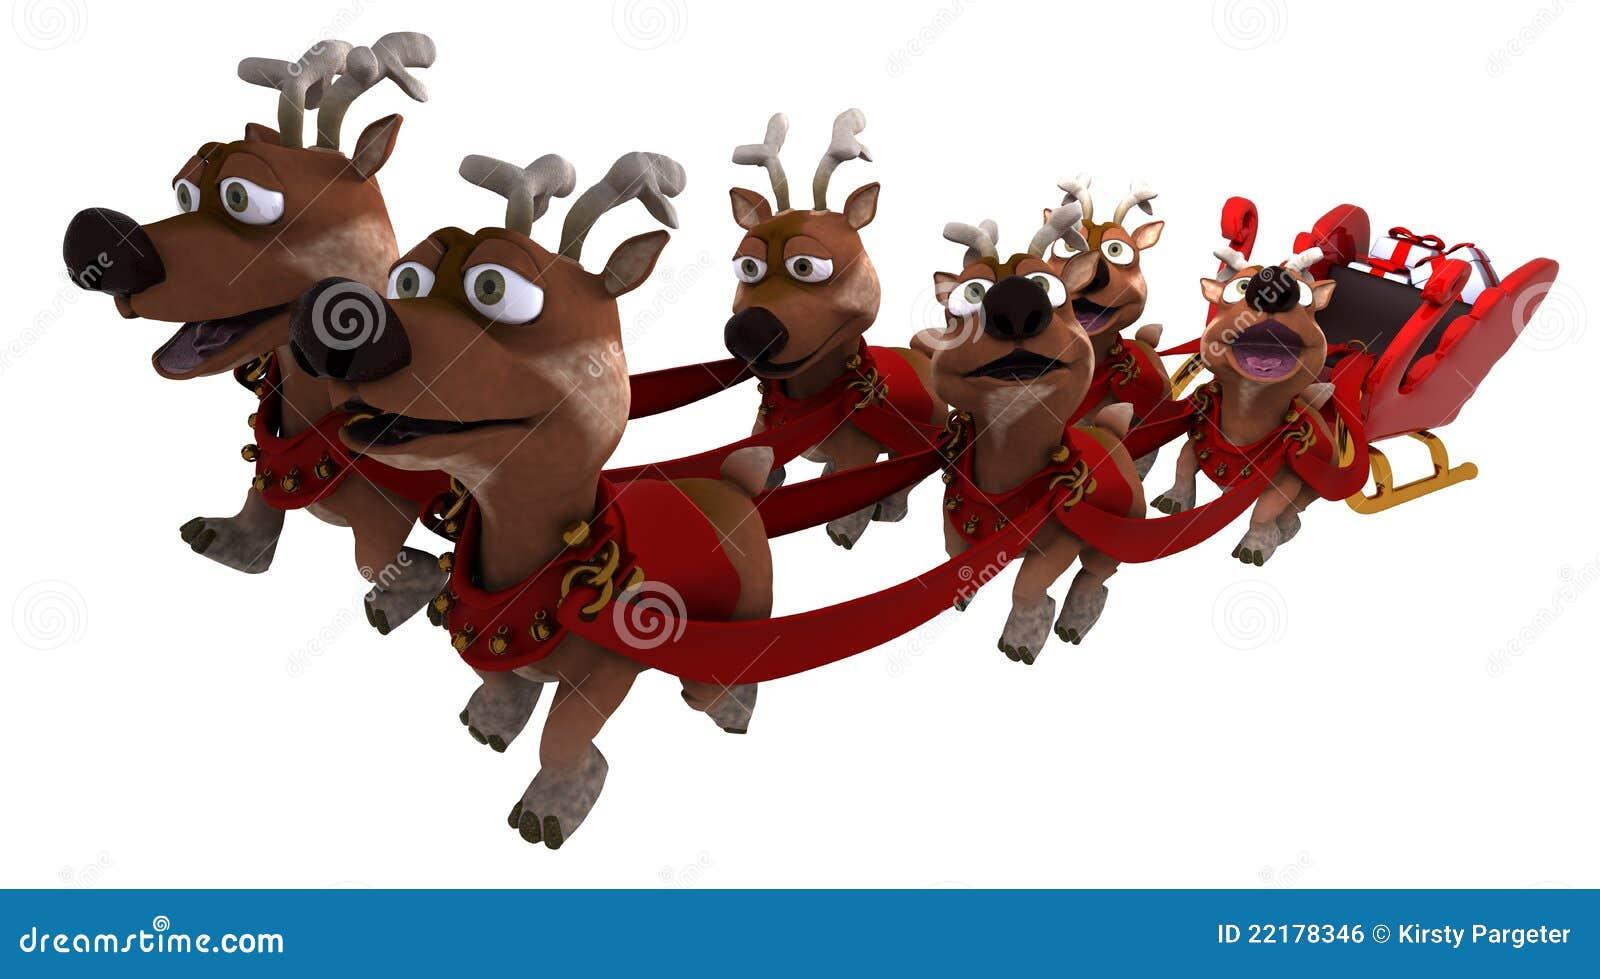 Rensantas sleigh